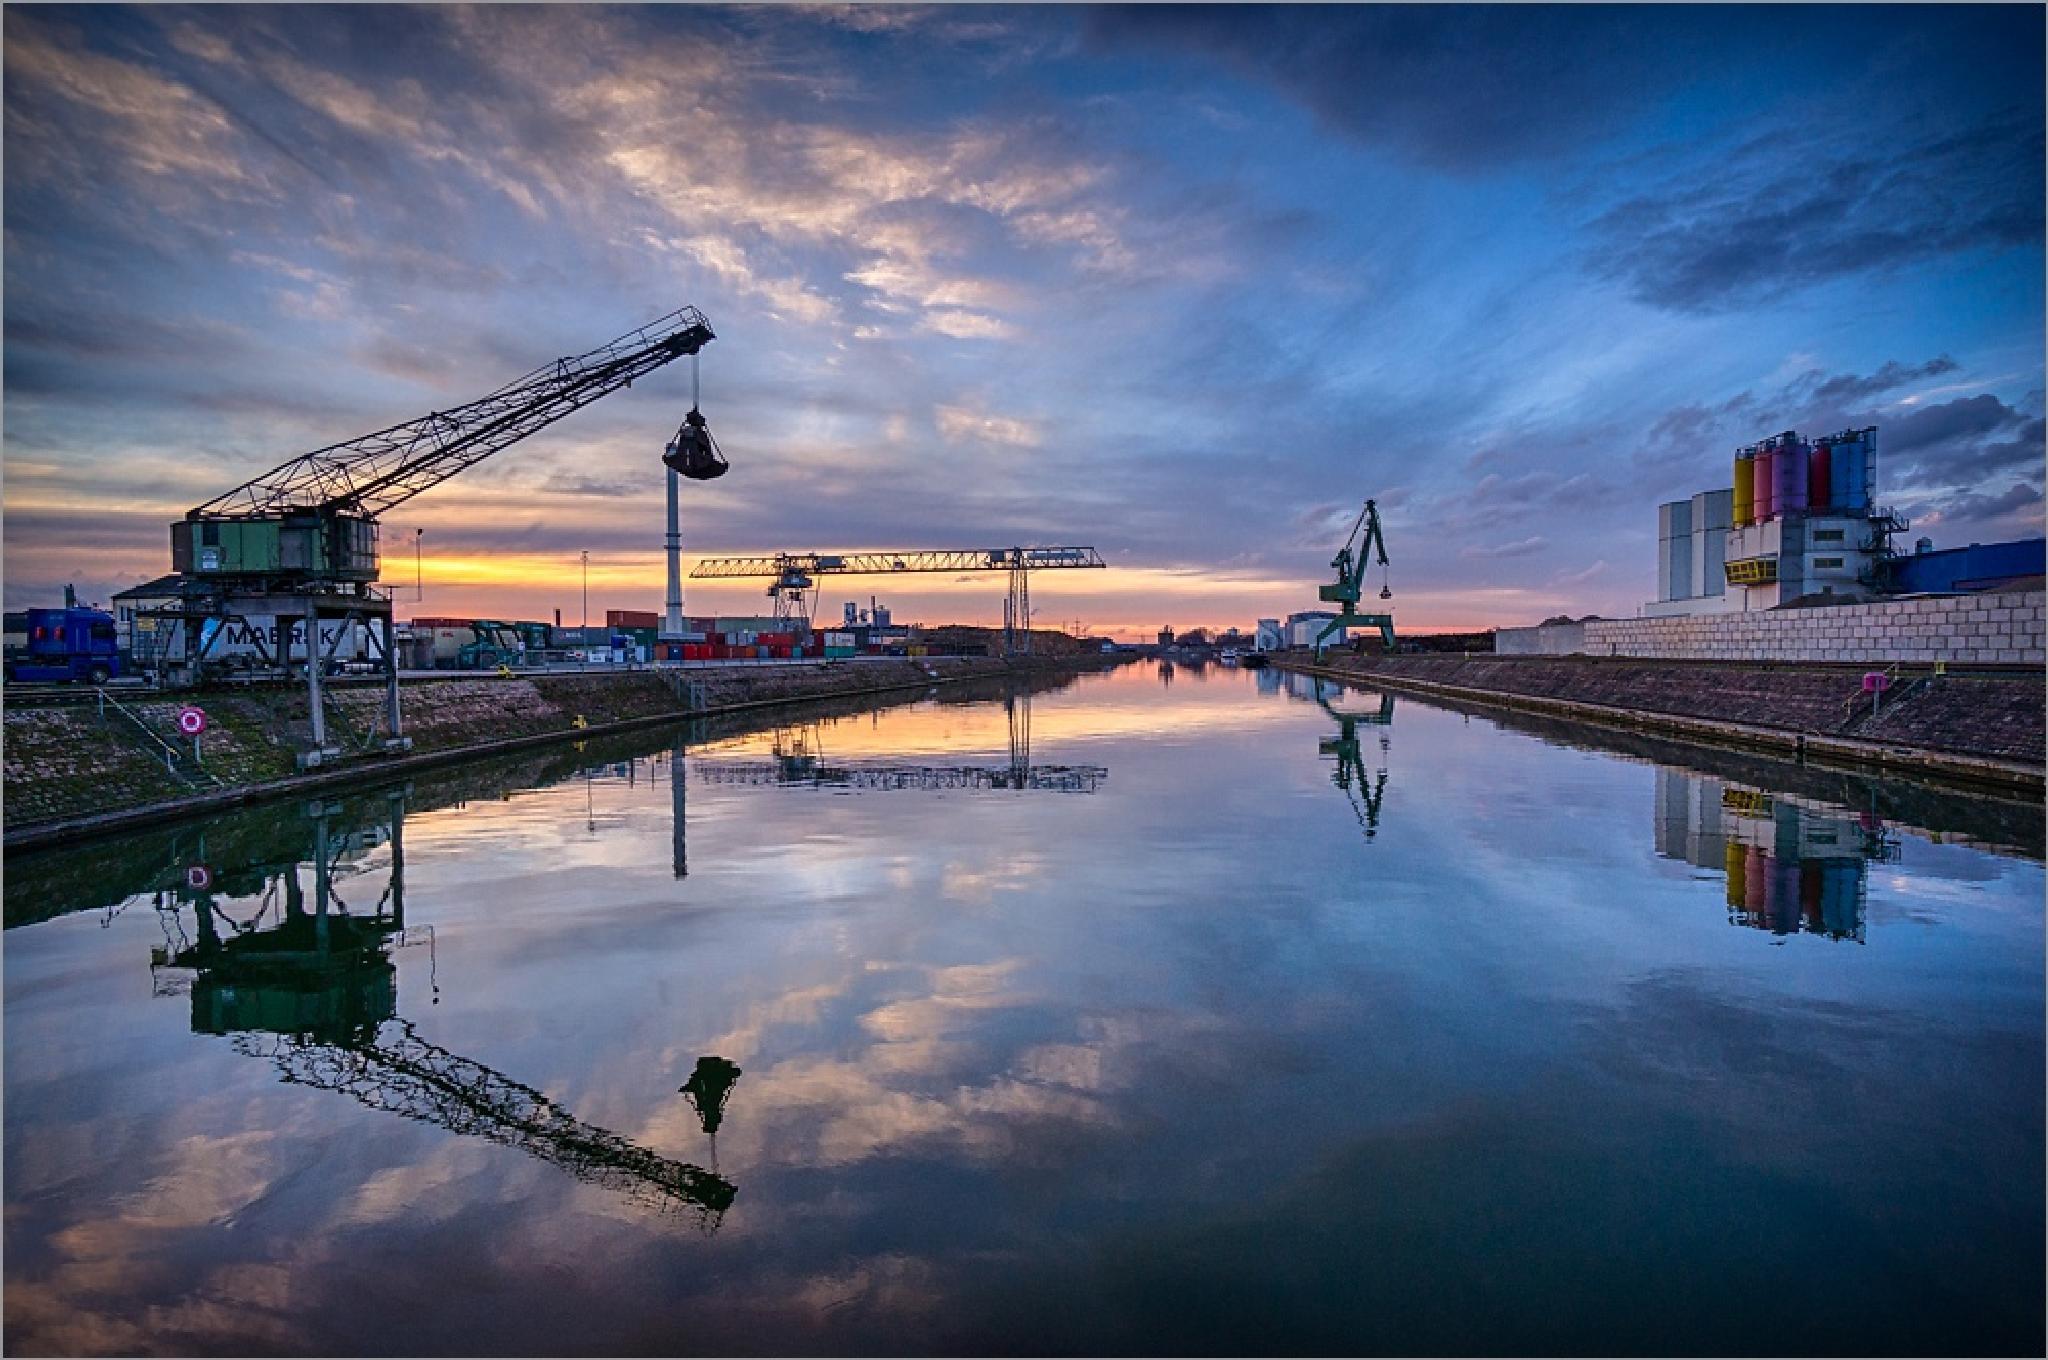 Docks by RolandUnger